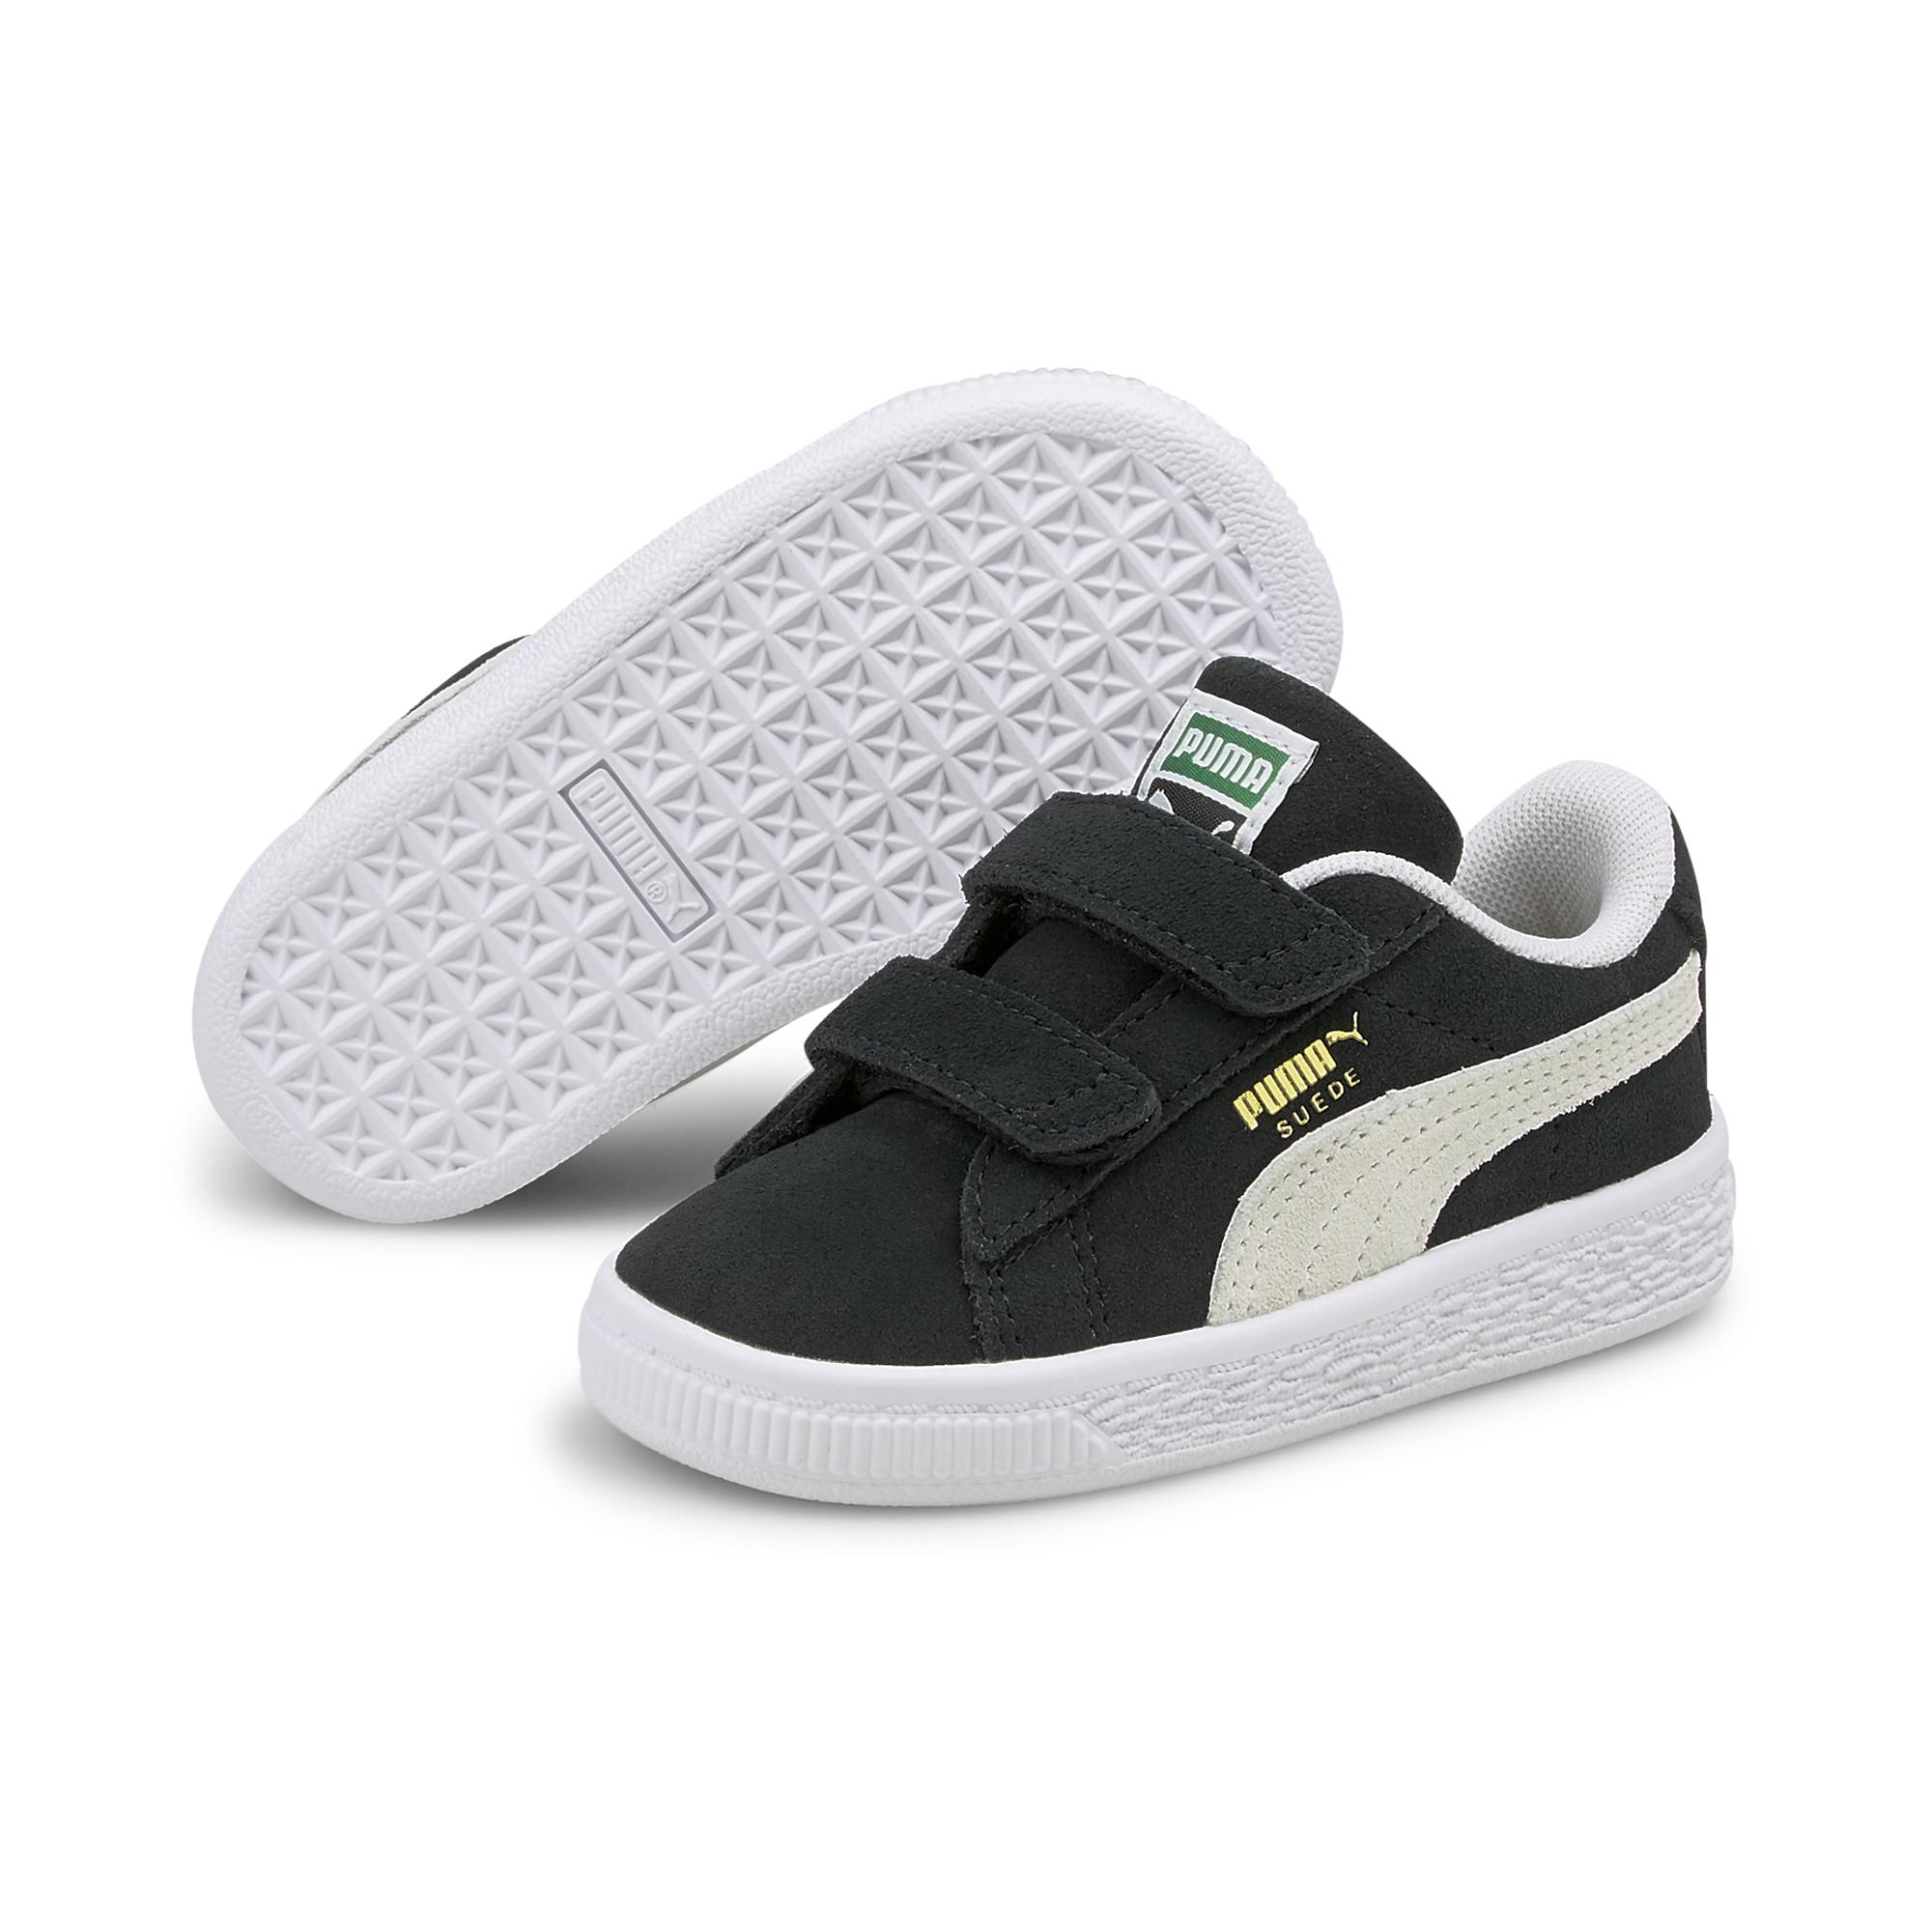 Puma Suede Classic XXI Babies sneakers, black, 23